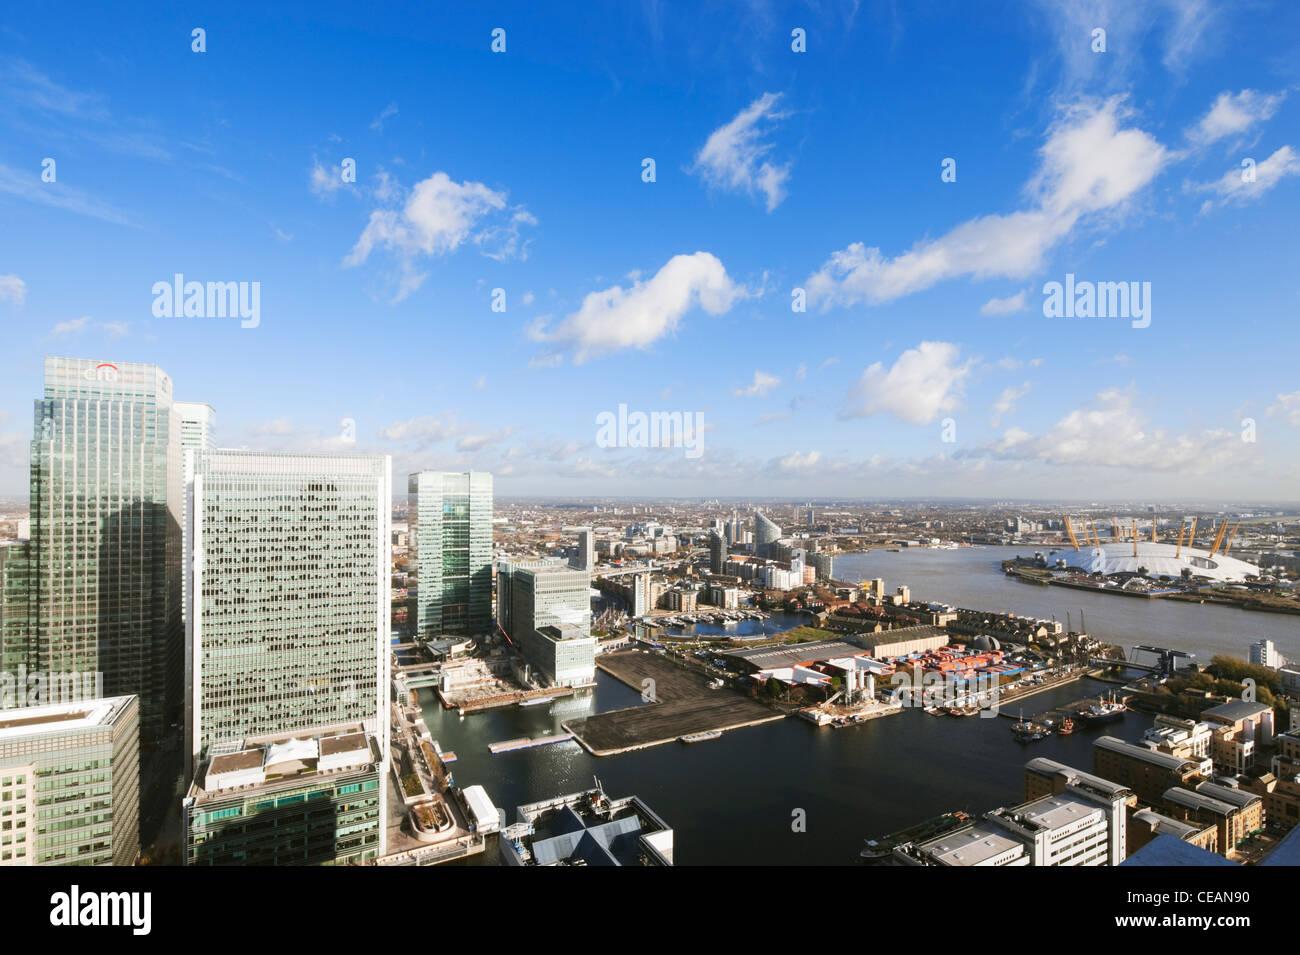 Canary Wharf buildings and O2 Arena; London; England - Stock Image